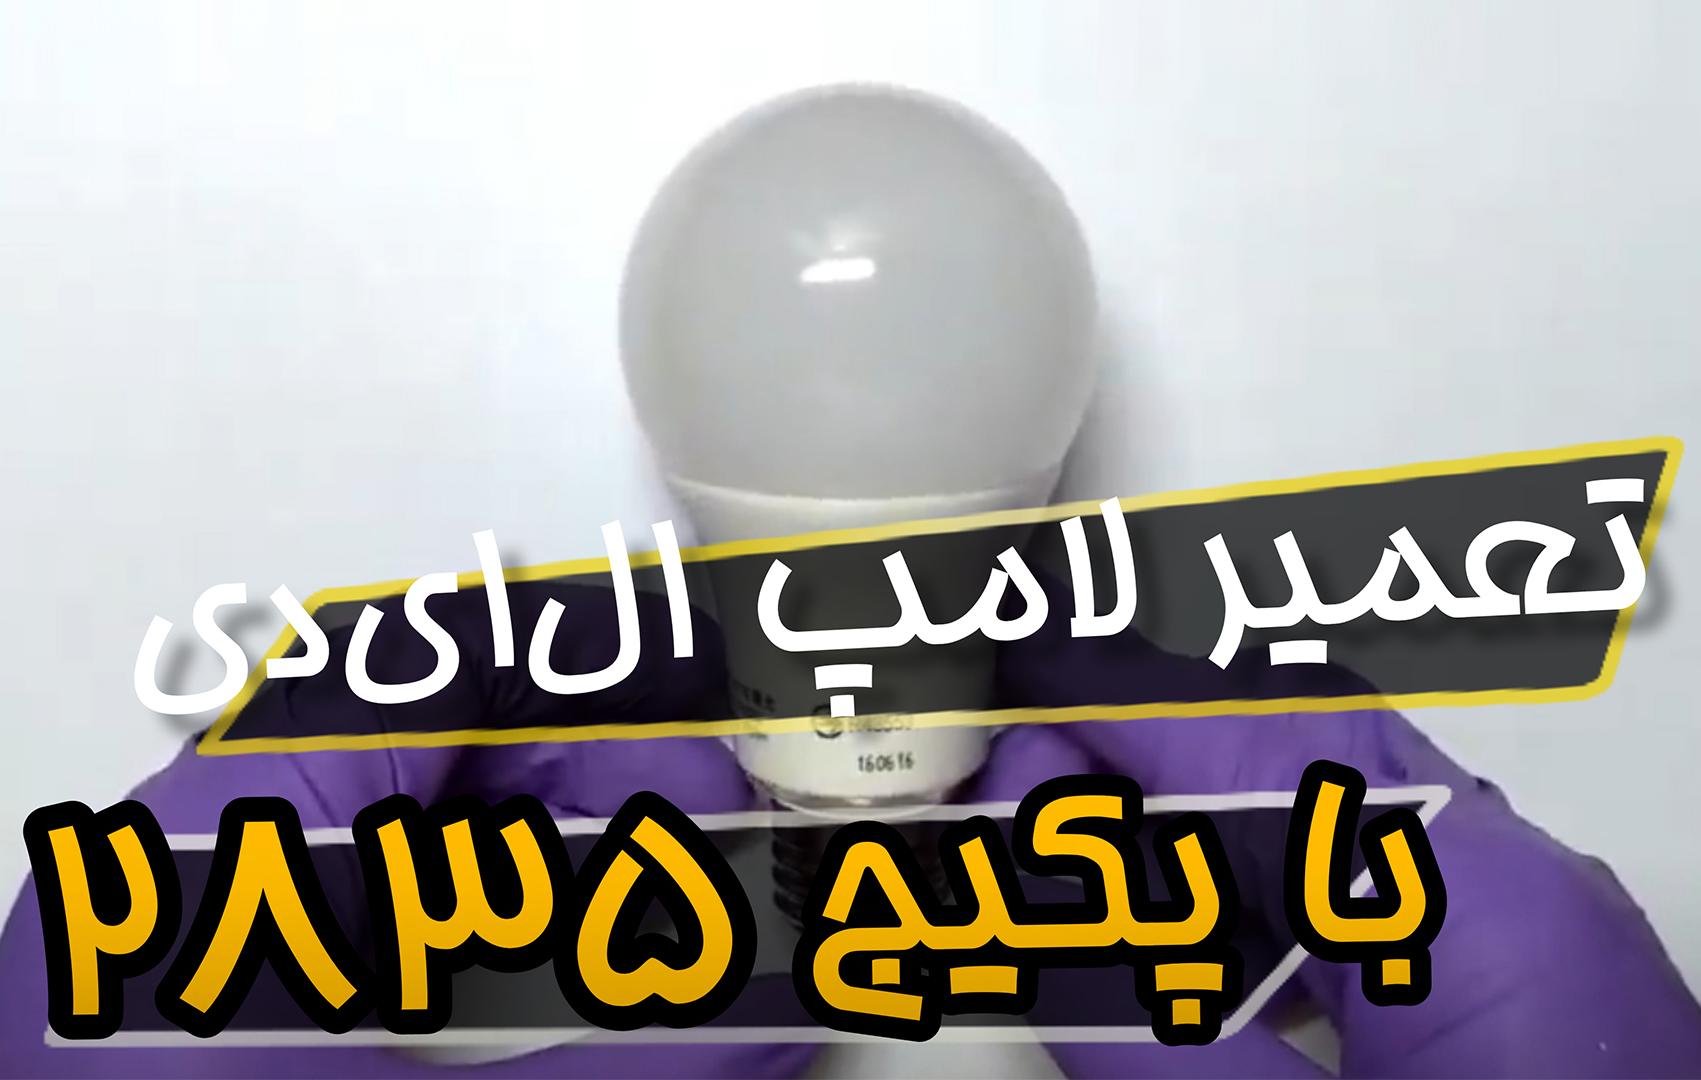 آموزش تعمیر لامپ ال ای دی با پکیج 2835